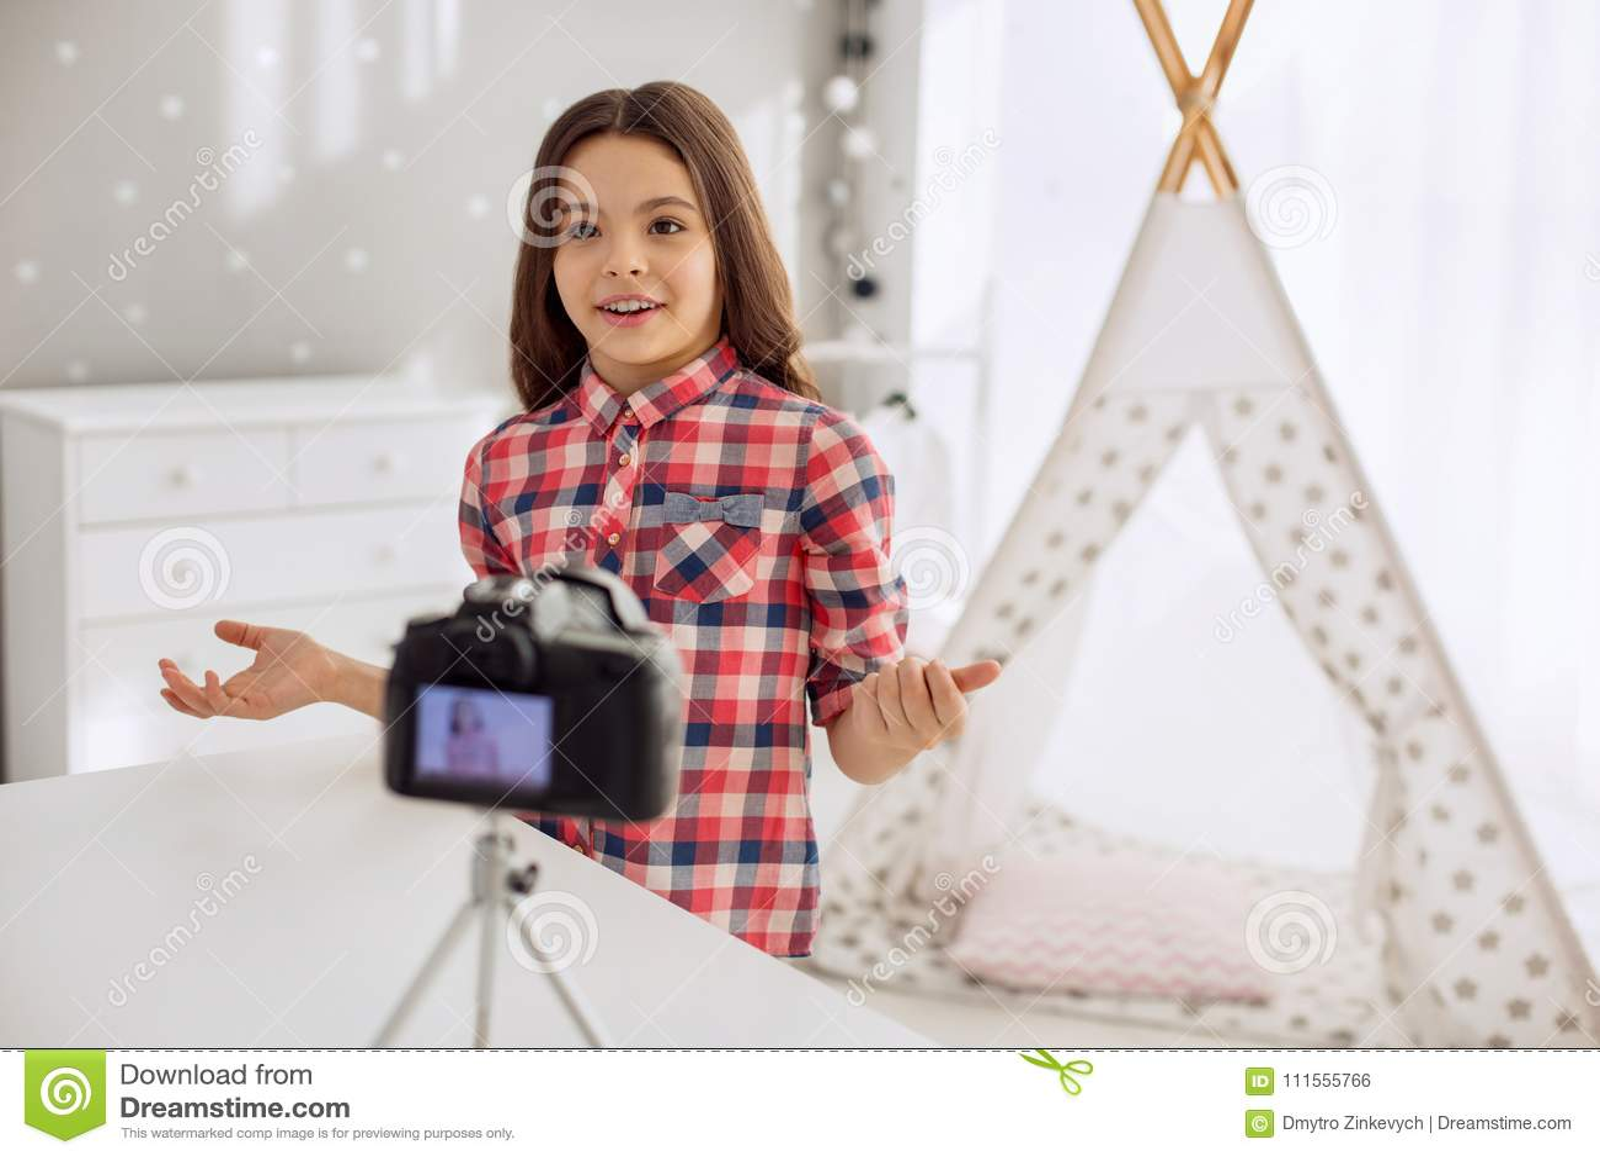 White girl fucked pics